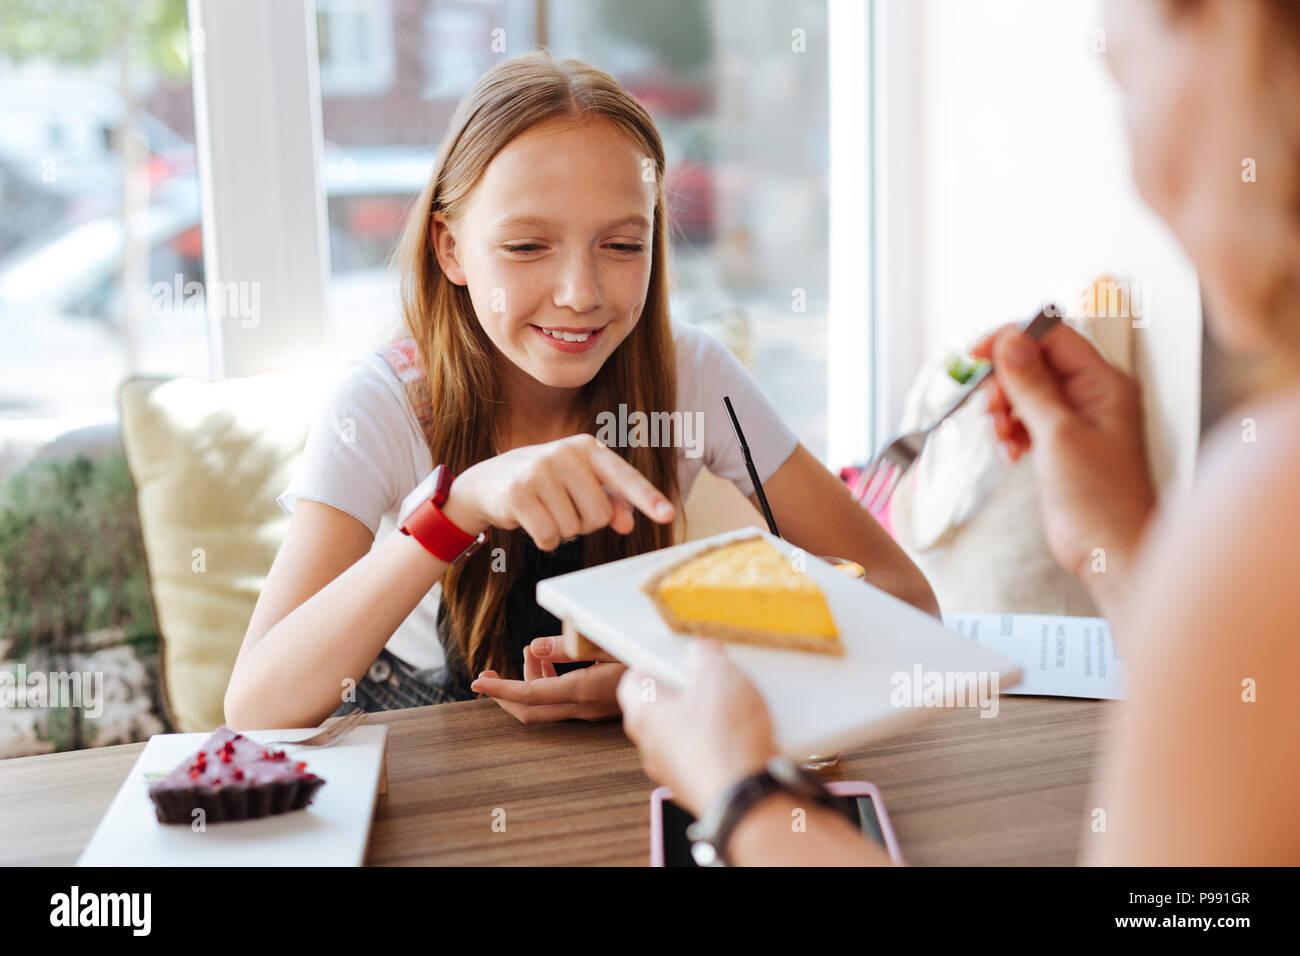 Smiling adolescent essayant cheesecake avec sa mère Photo Stock